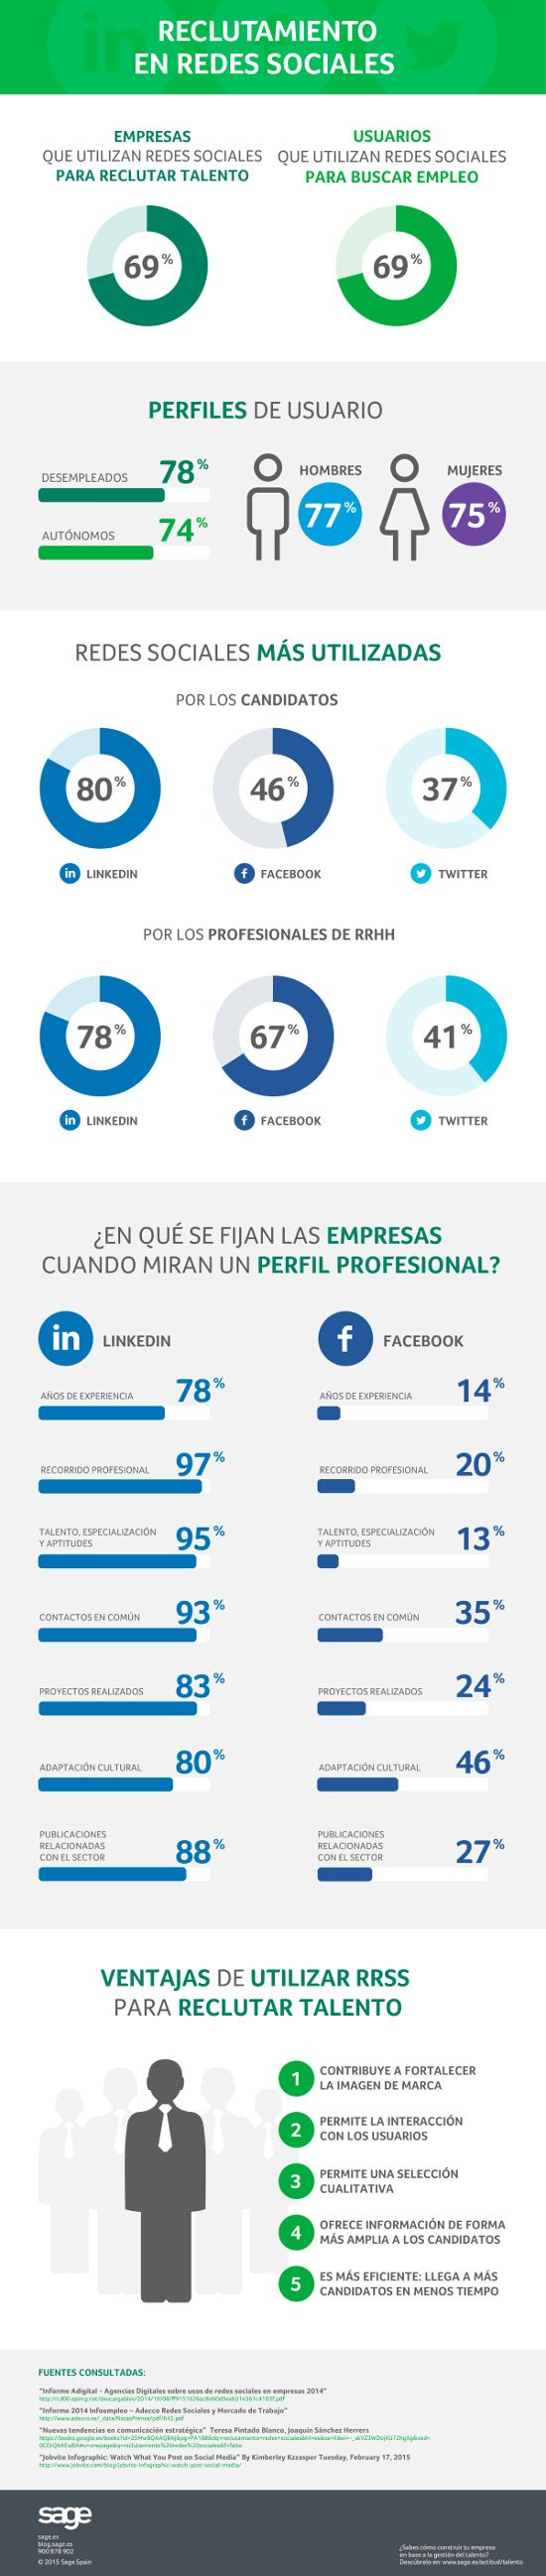 Reclutamiento en #RedesSociales #empleo www.rubendelaosa.com